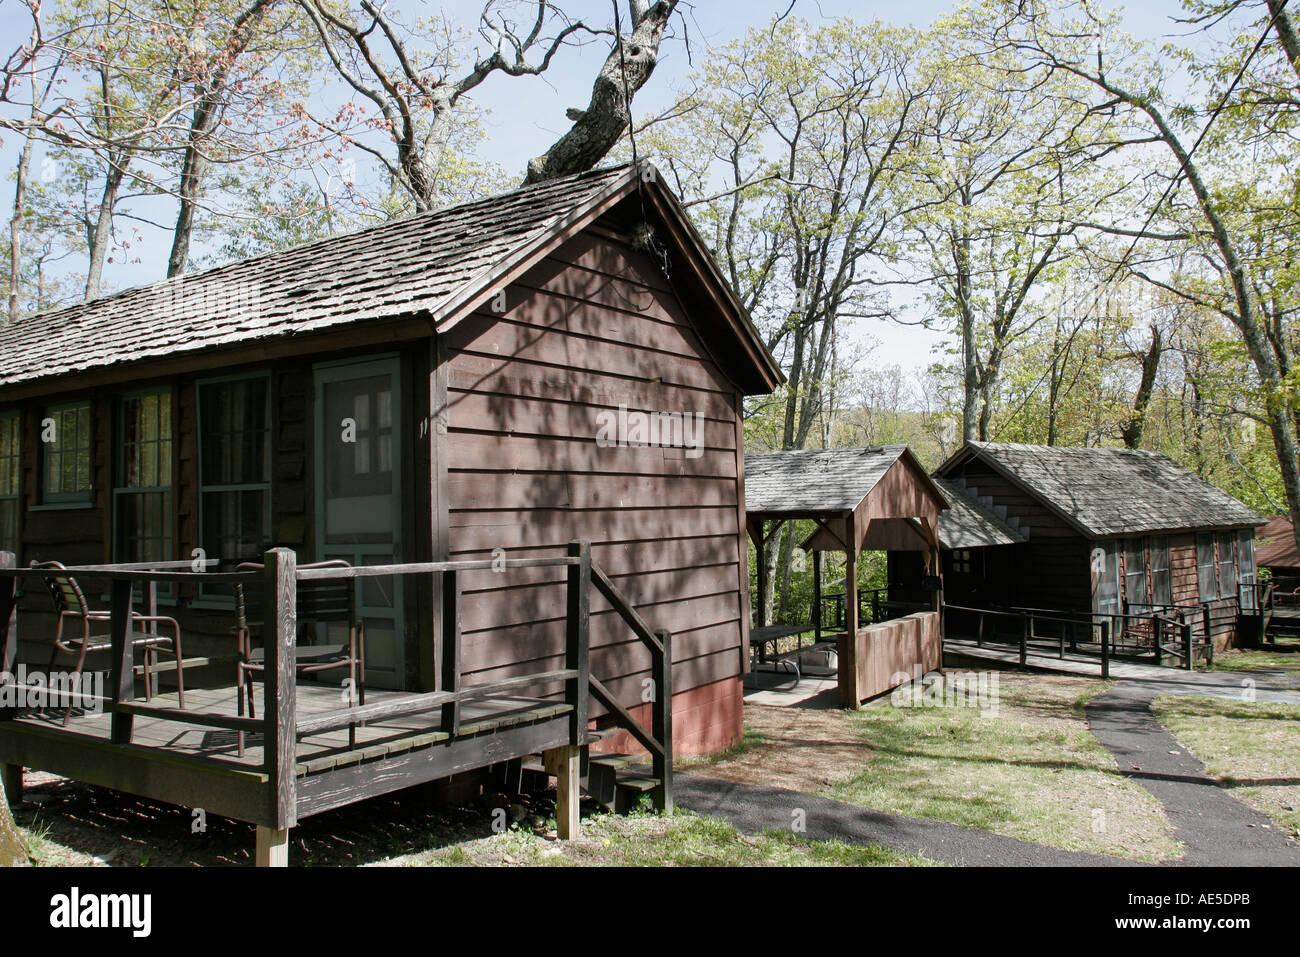 Shenandoah National Park VirginiaLewis Mountain Cabins former Negro segregated rental vacation cabins - Stock Image